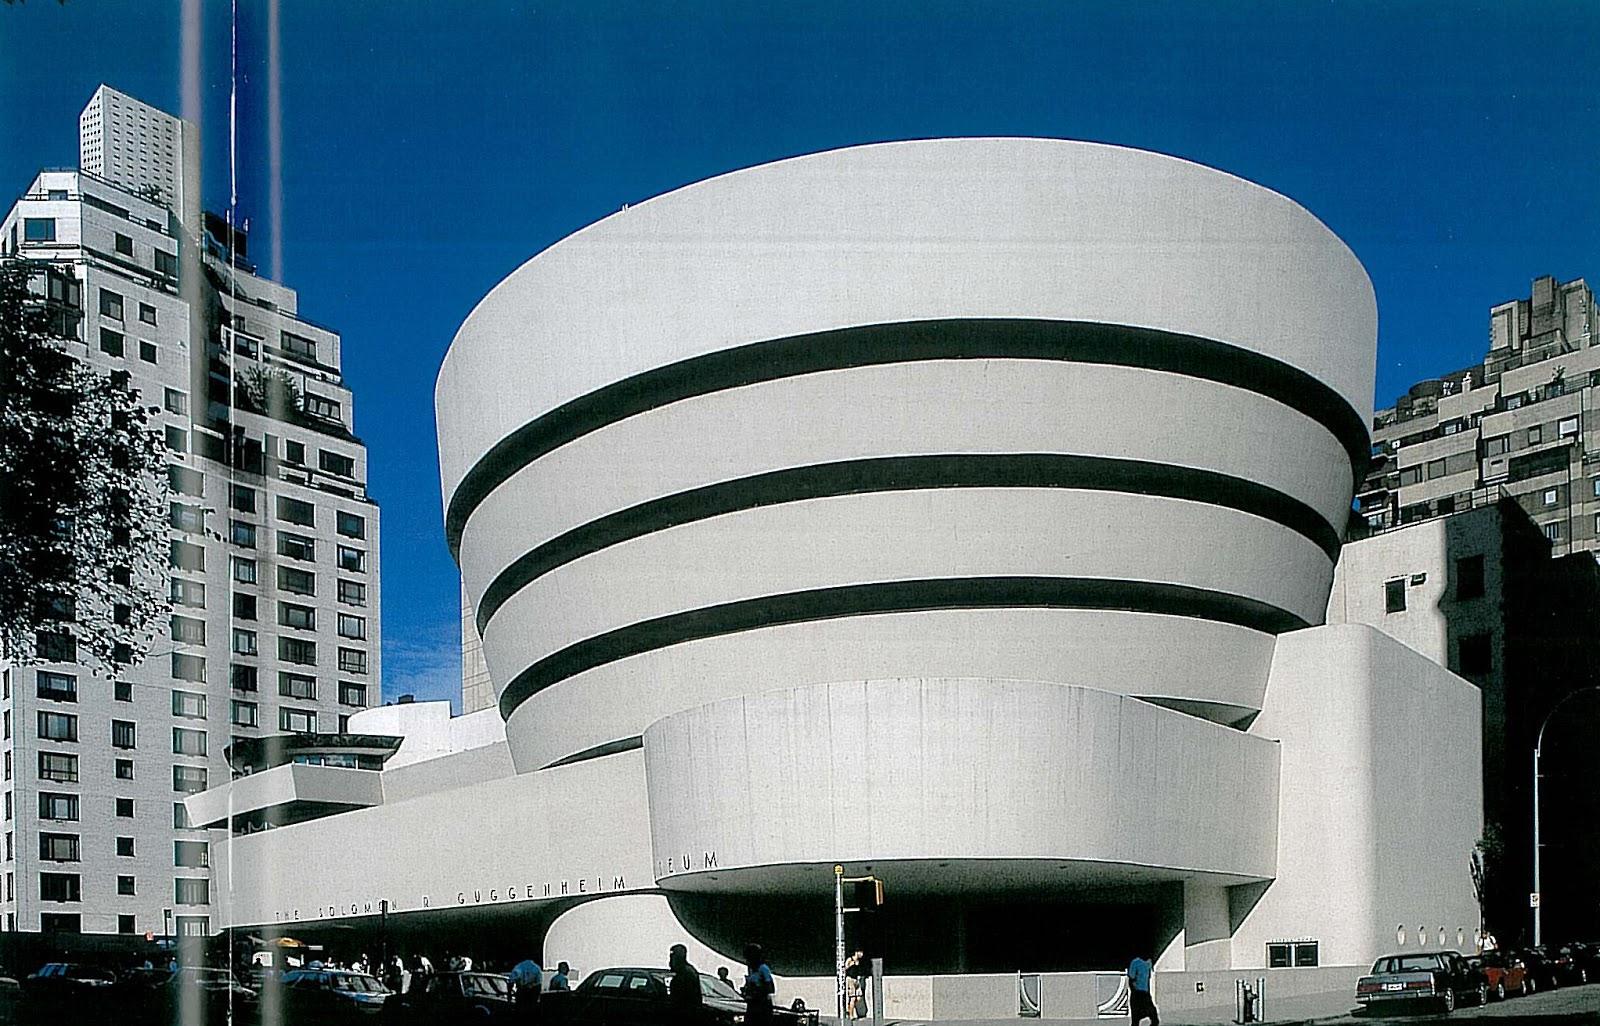 Bien-aimé Art visuel: Frank Lloyd Wright - Le Musée Guggenheim - New York GE05